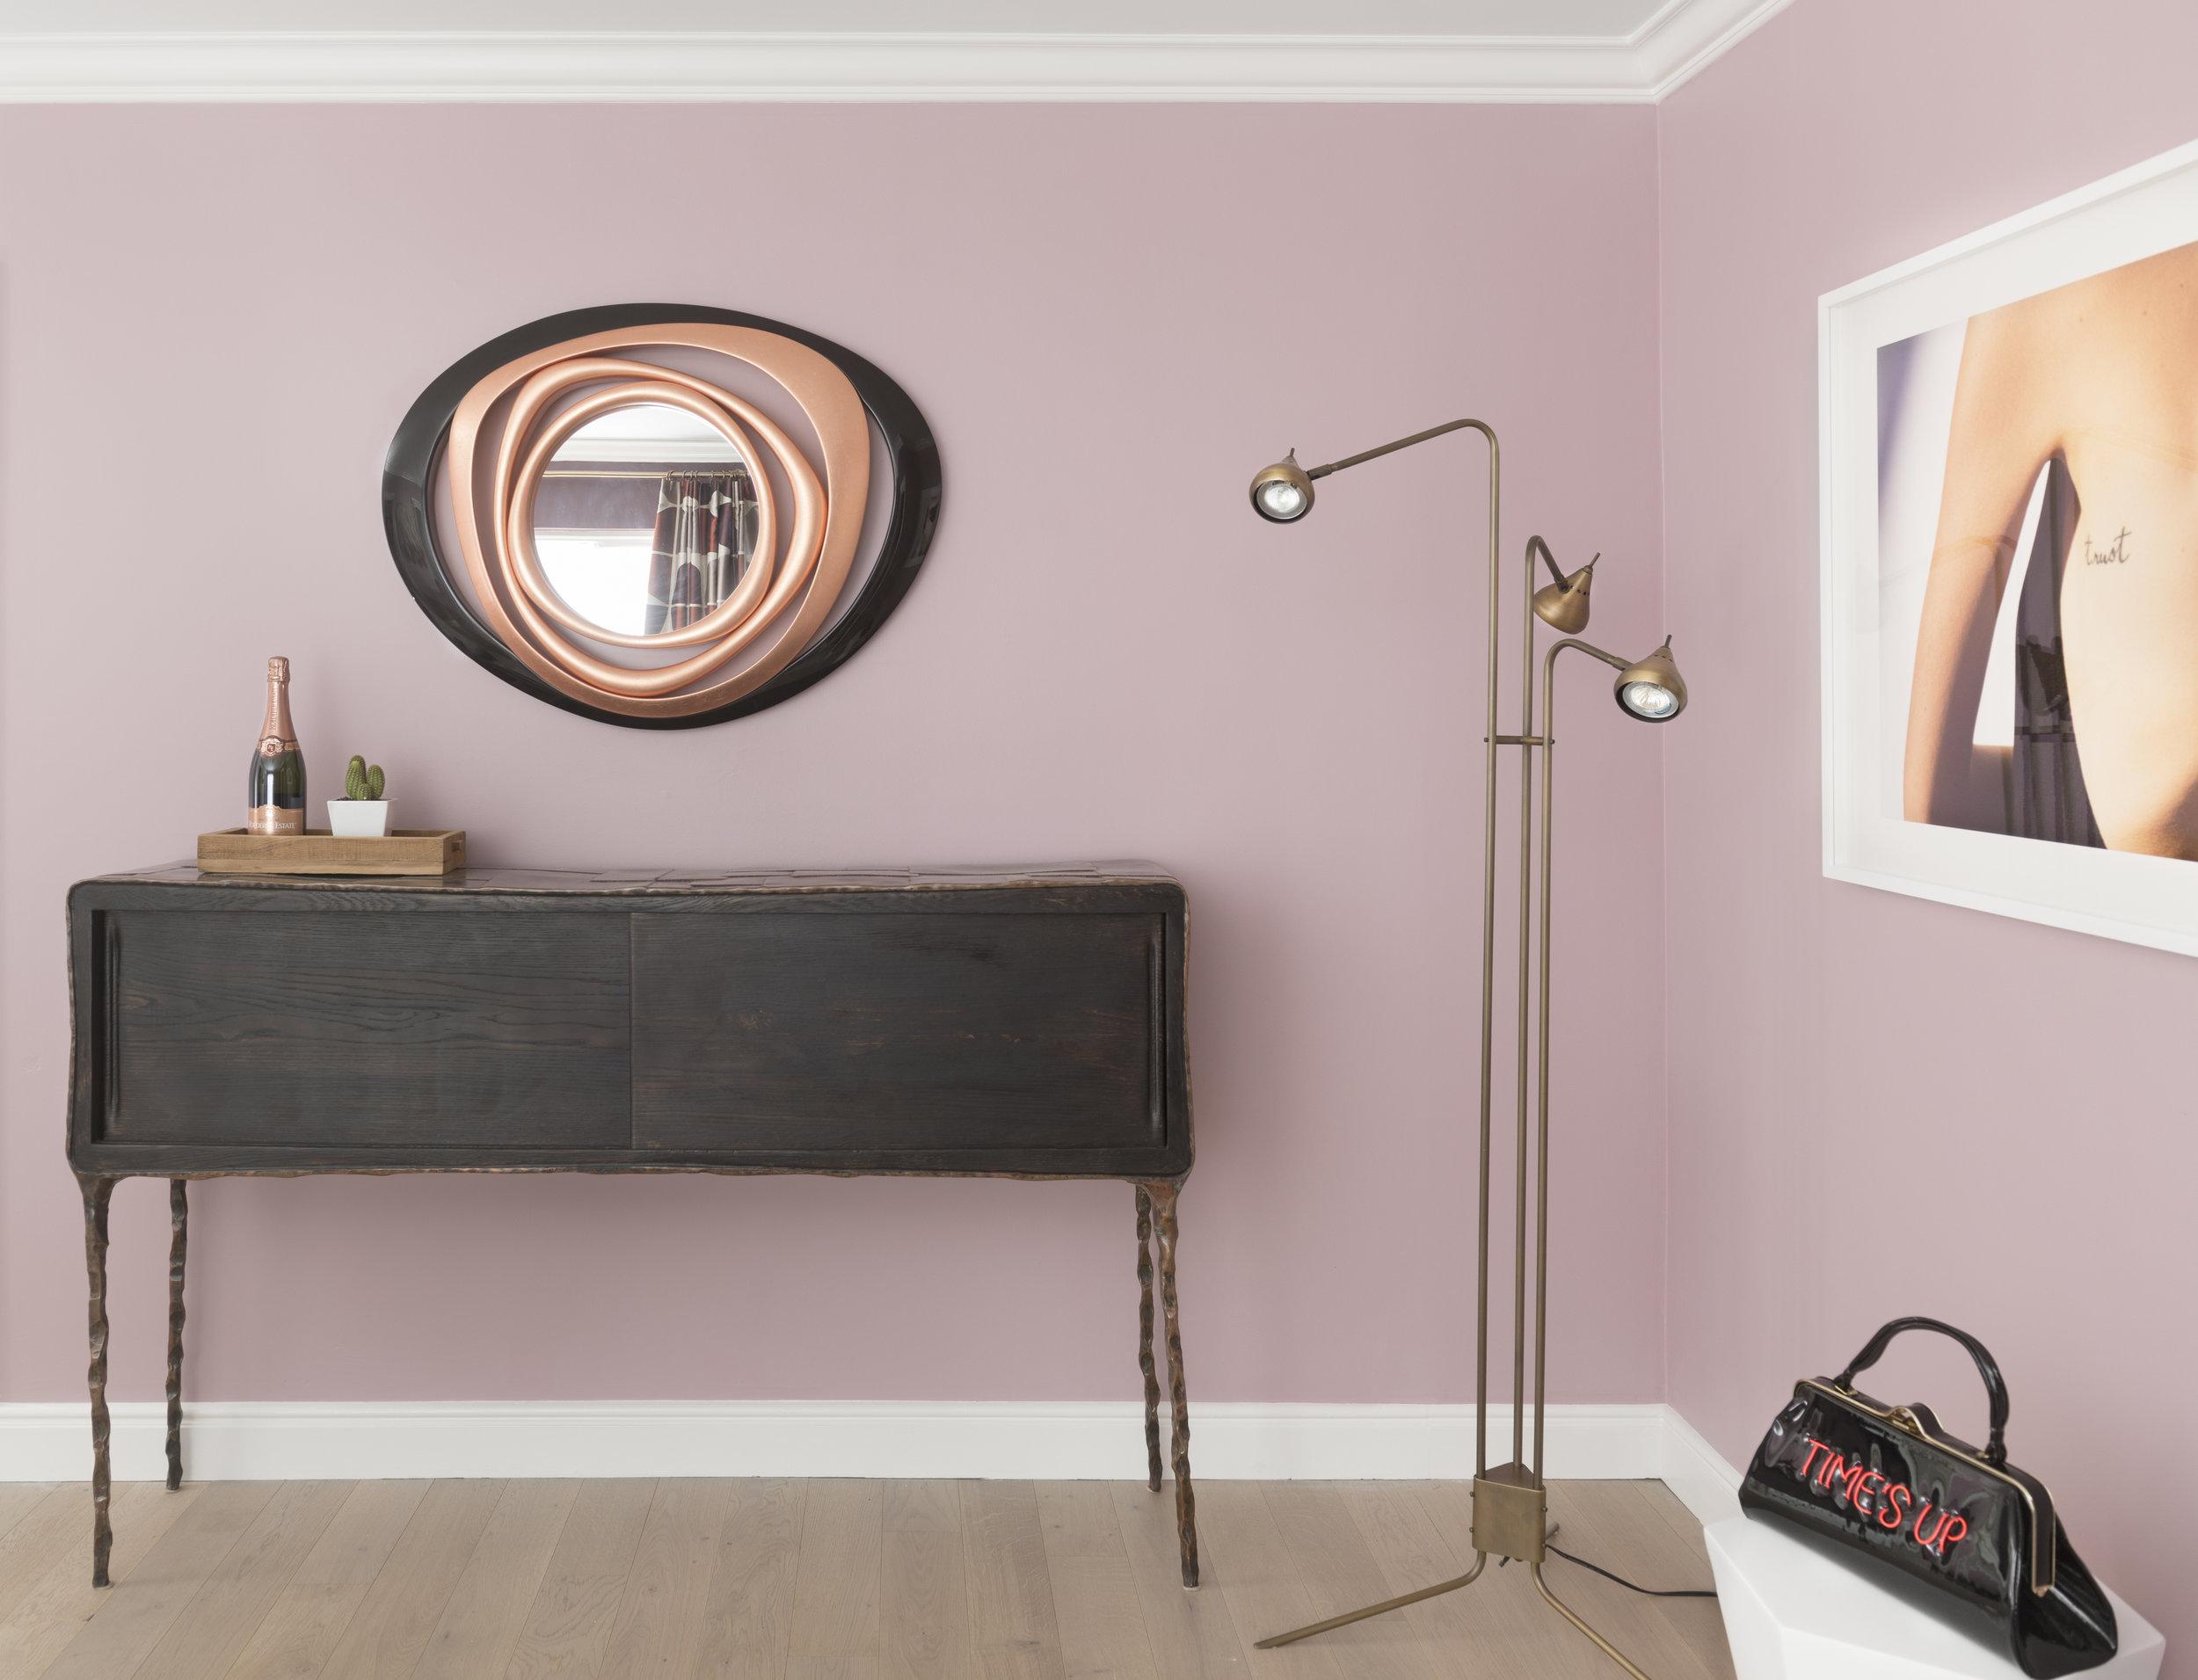 Rose Lounge Melanie Coddington Hardwood Flooring Install